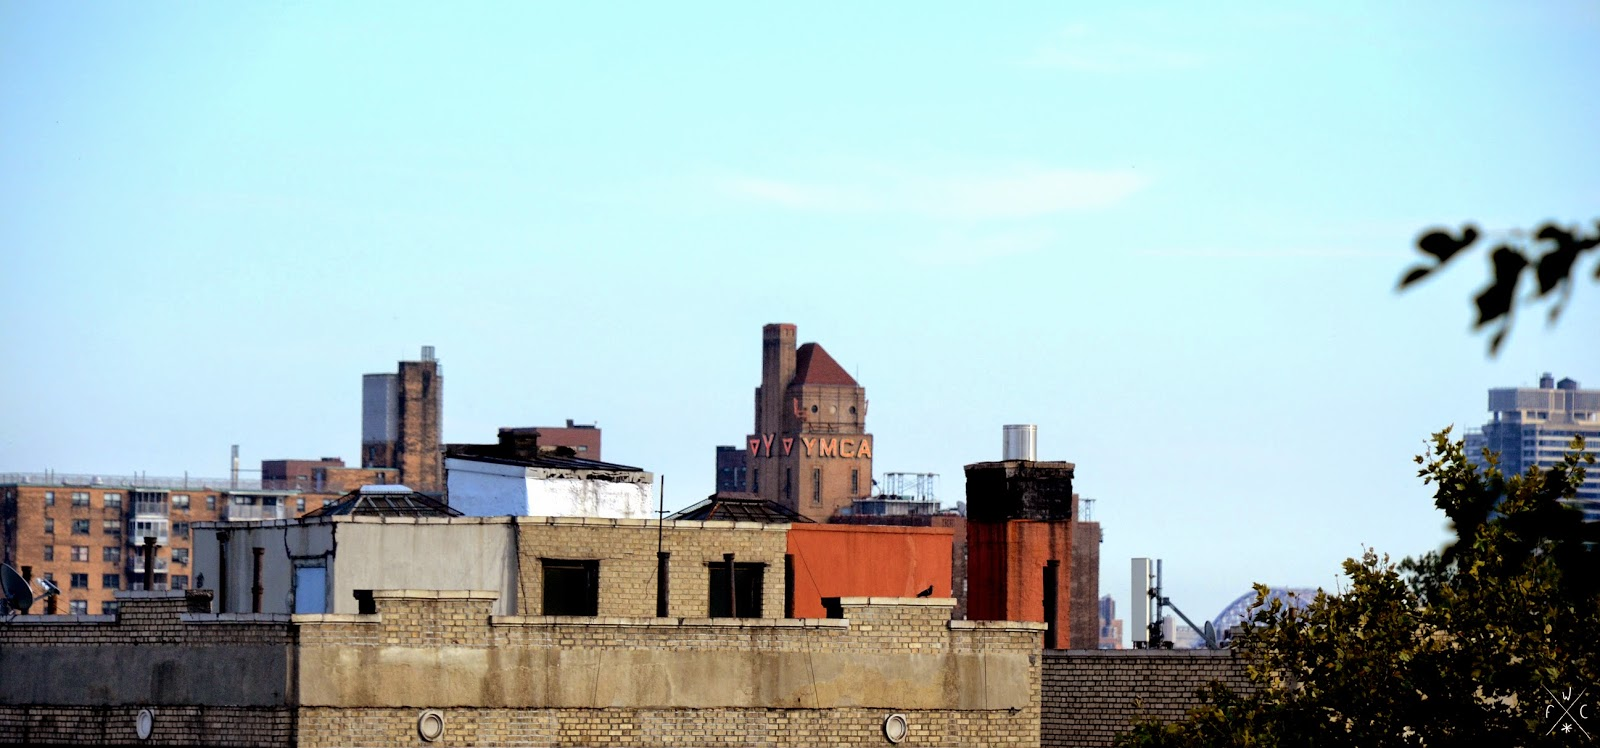 YMCA, Harlem, New York, USA